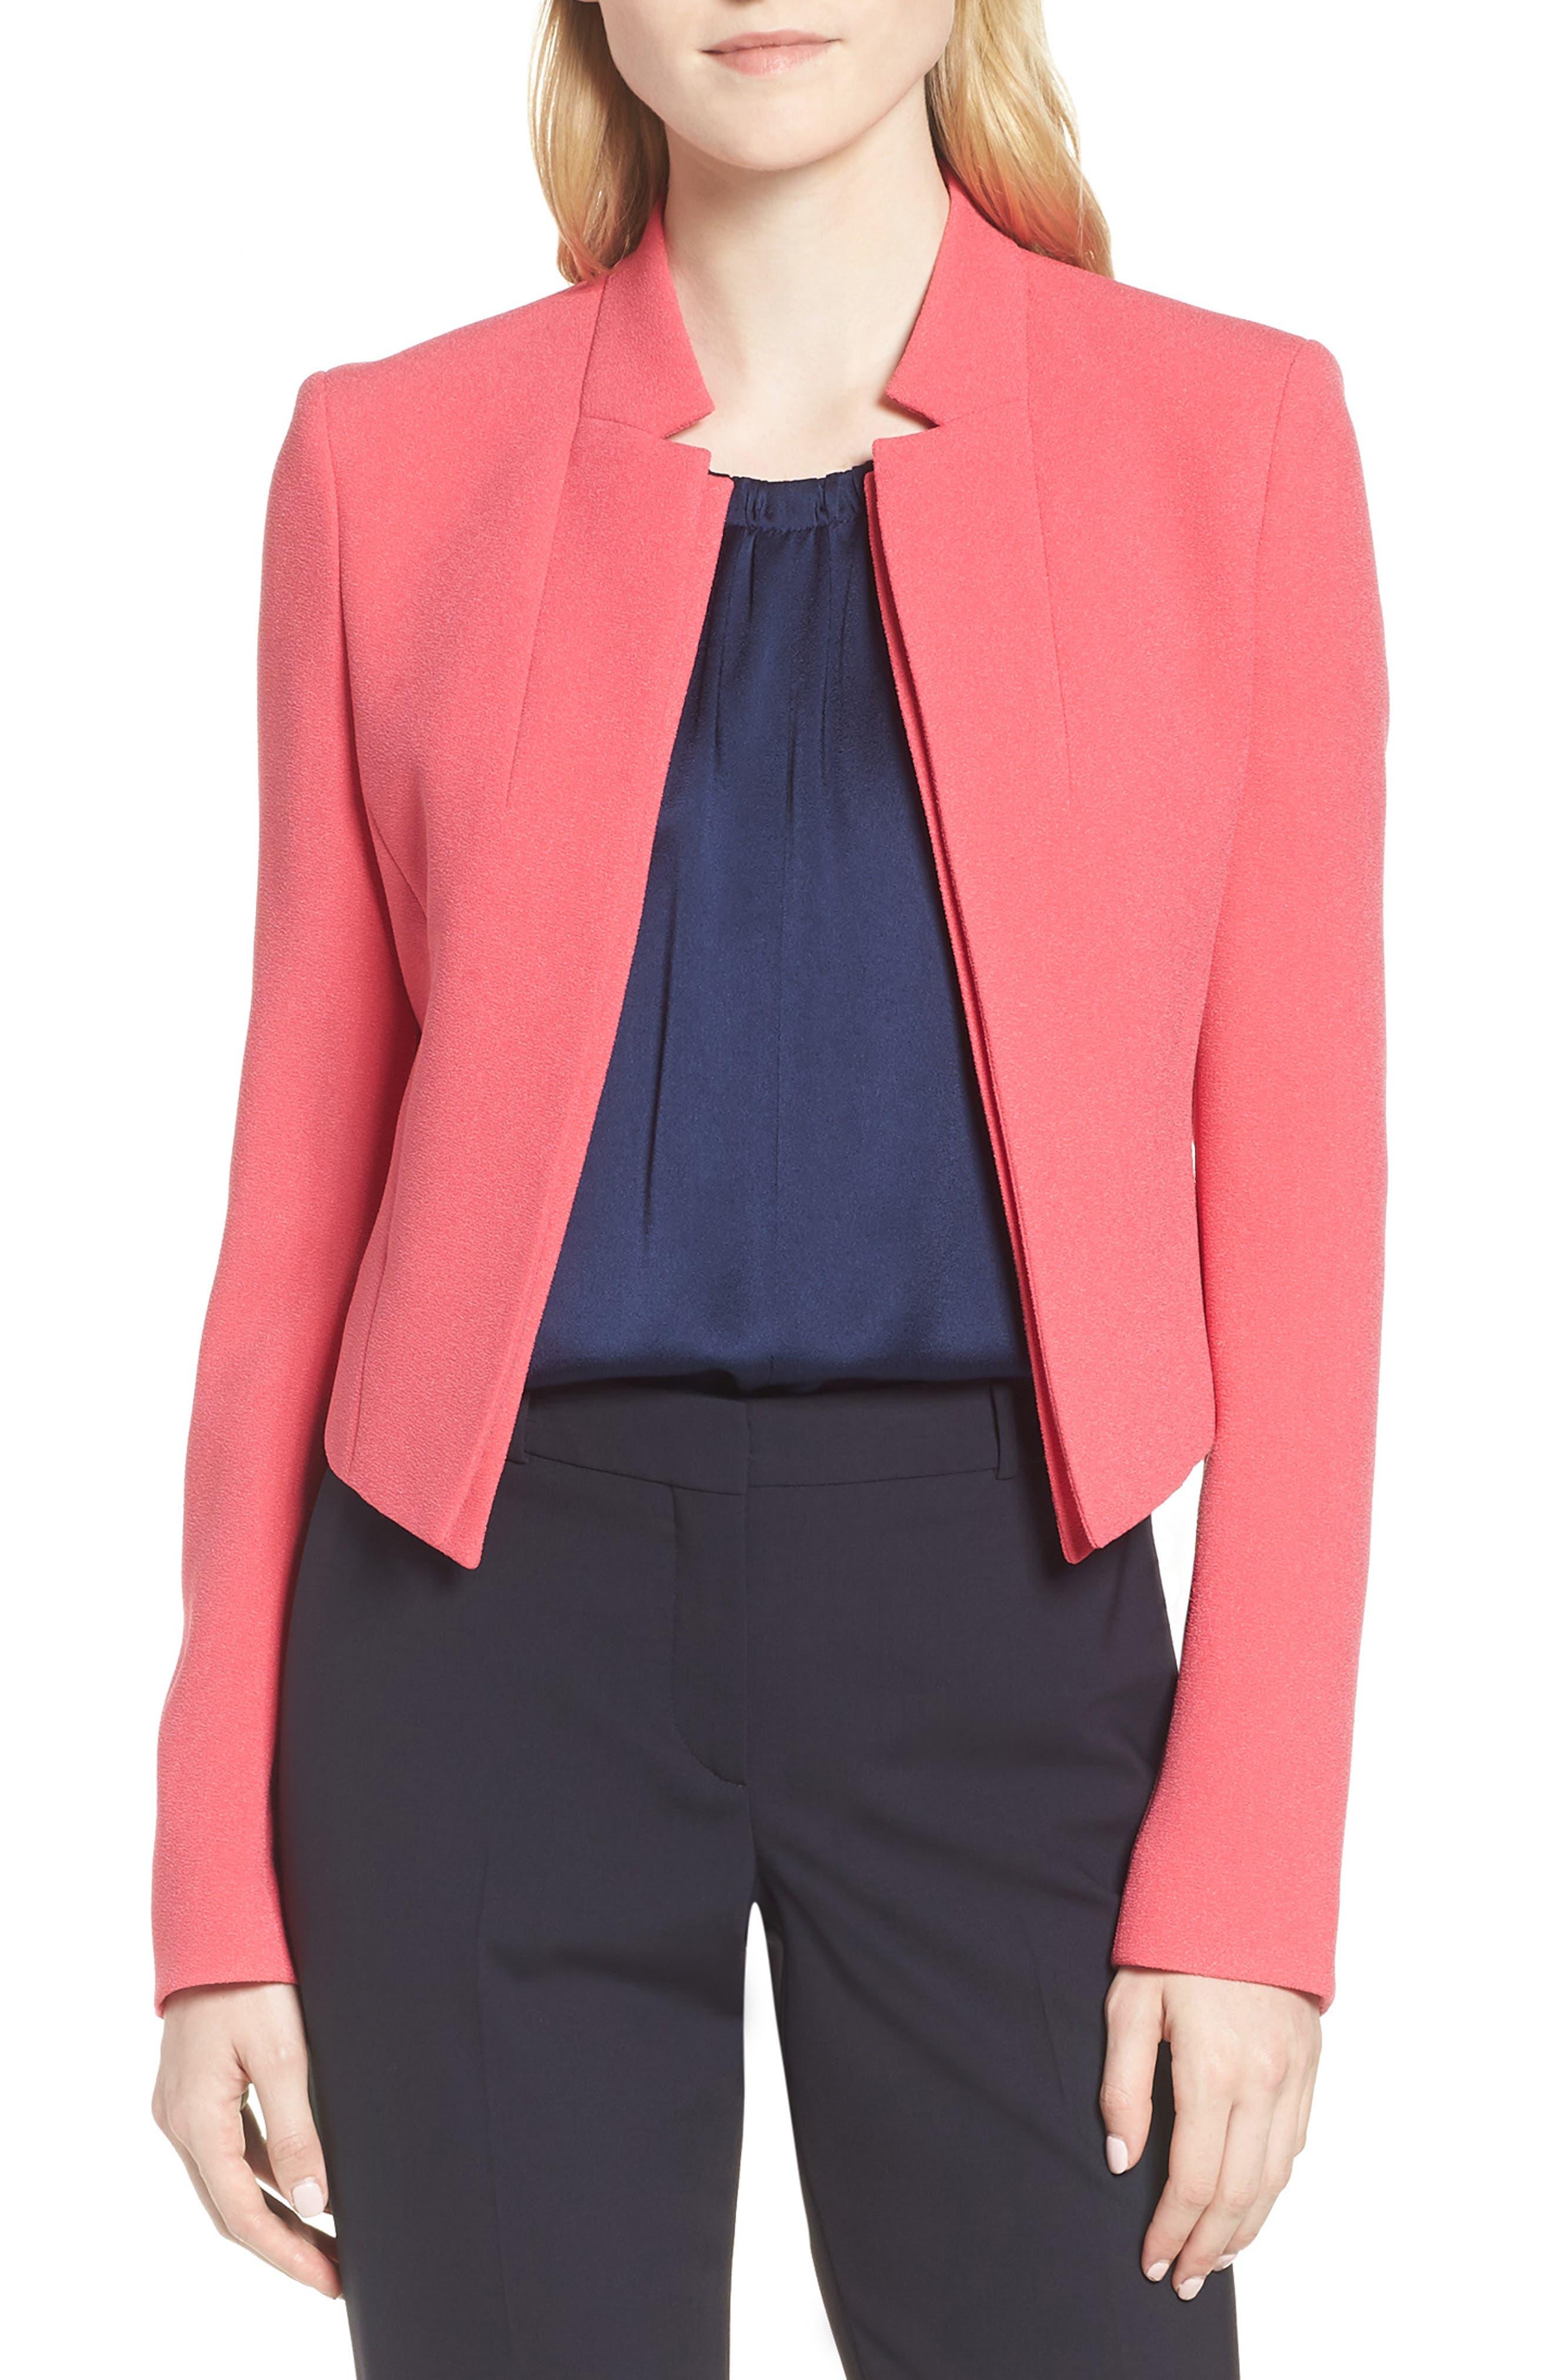 Jisala Compact Crepe Crop Jacket,                         Main,                         color, Lychee Pink